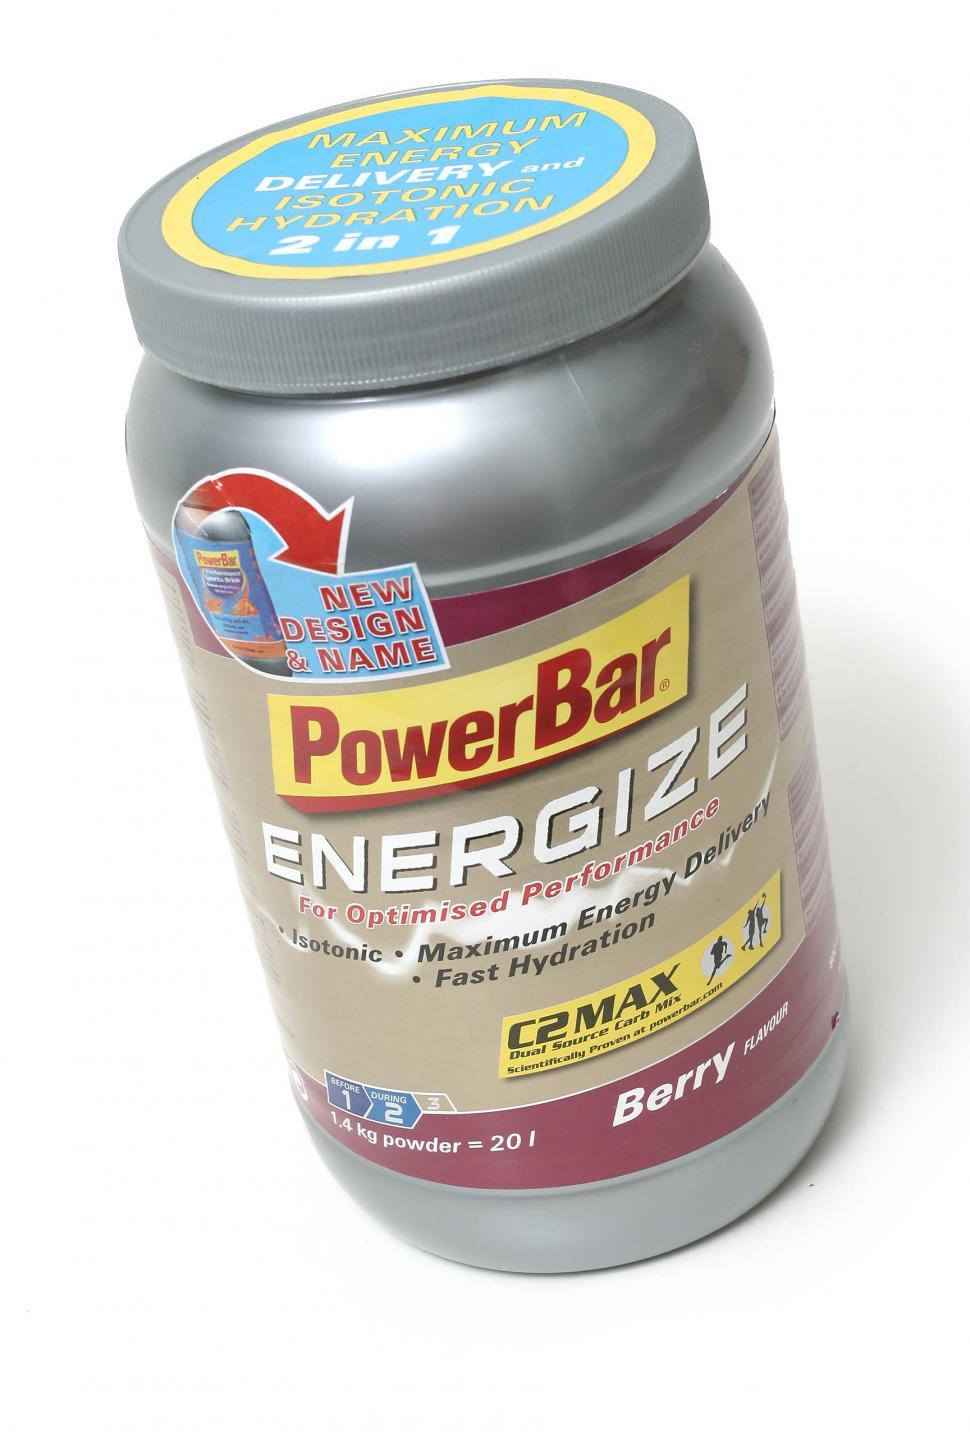 Powerbar Energize isotonic drink